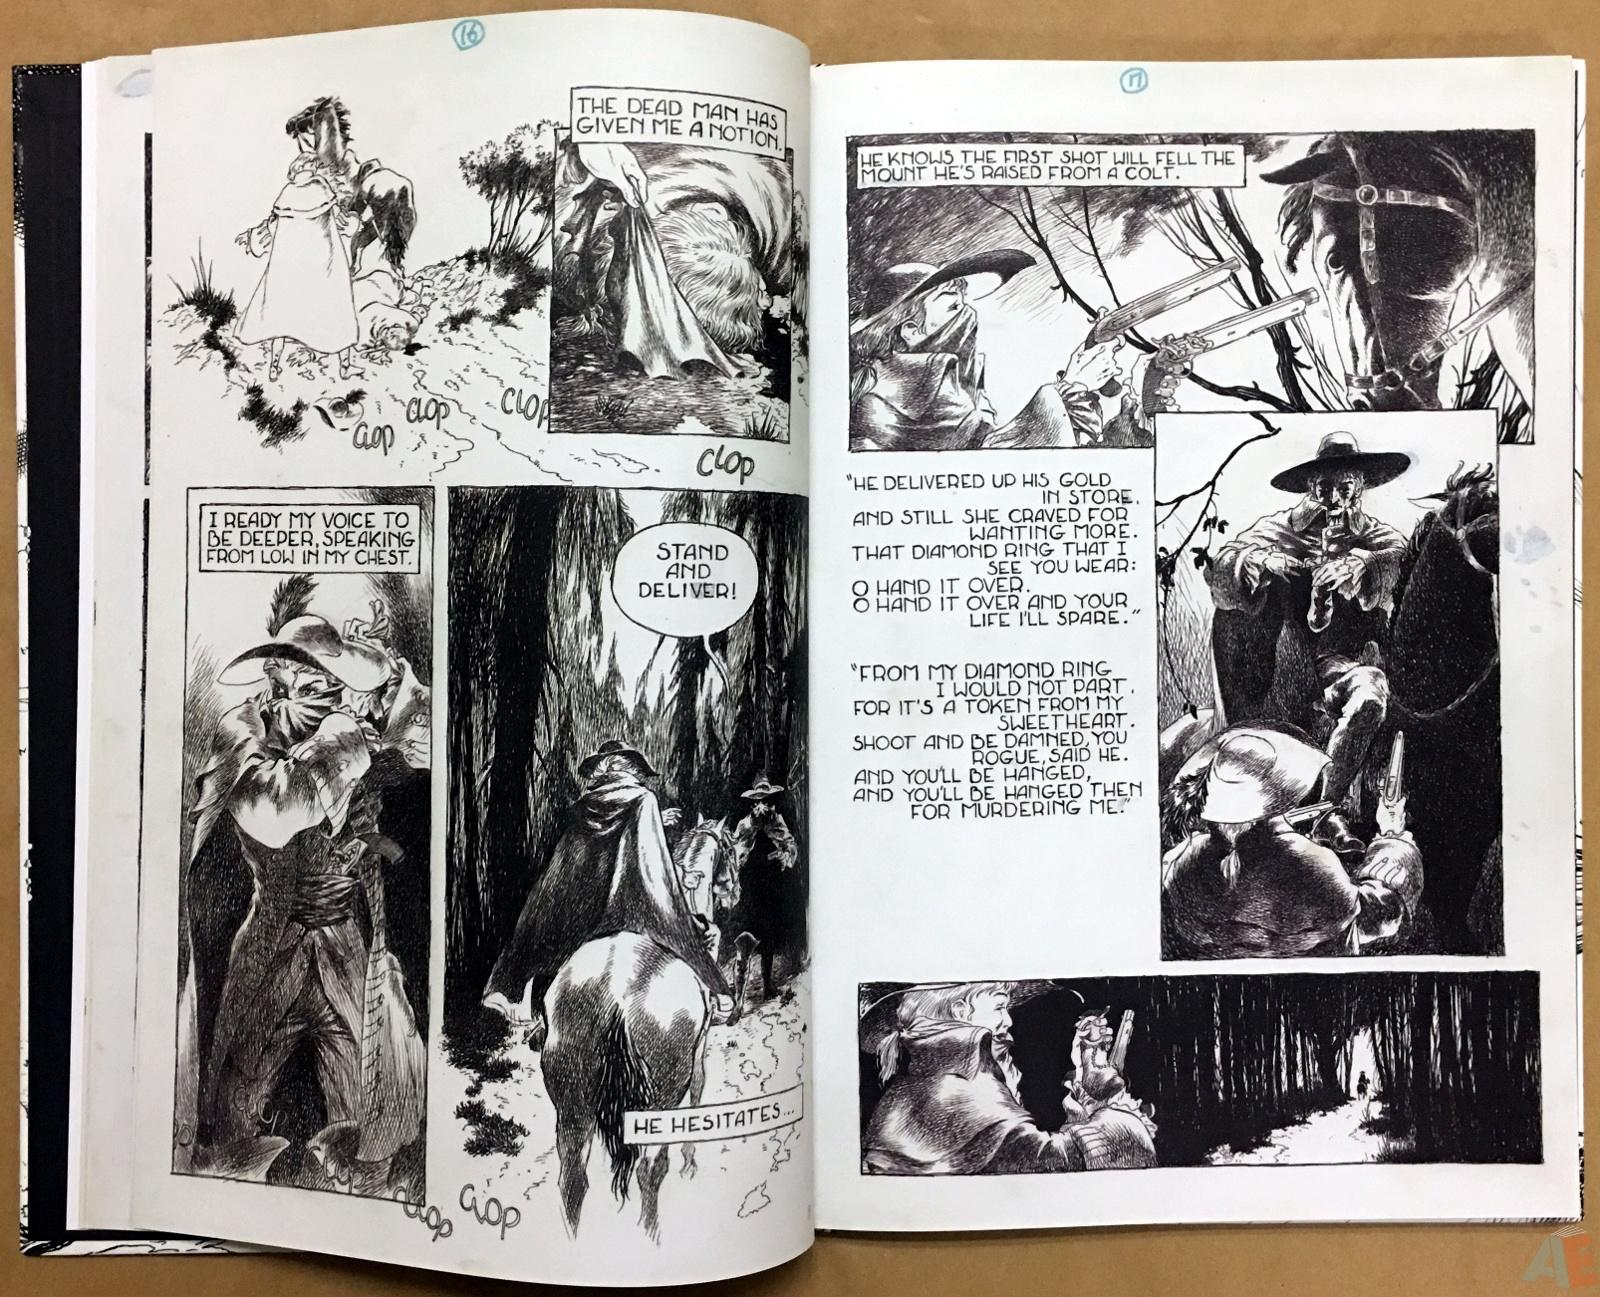 The Book Of Ballads, The Original Art Edition 16